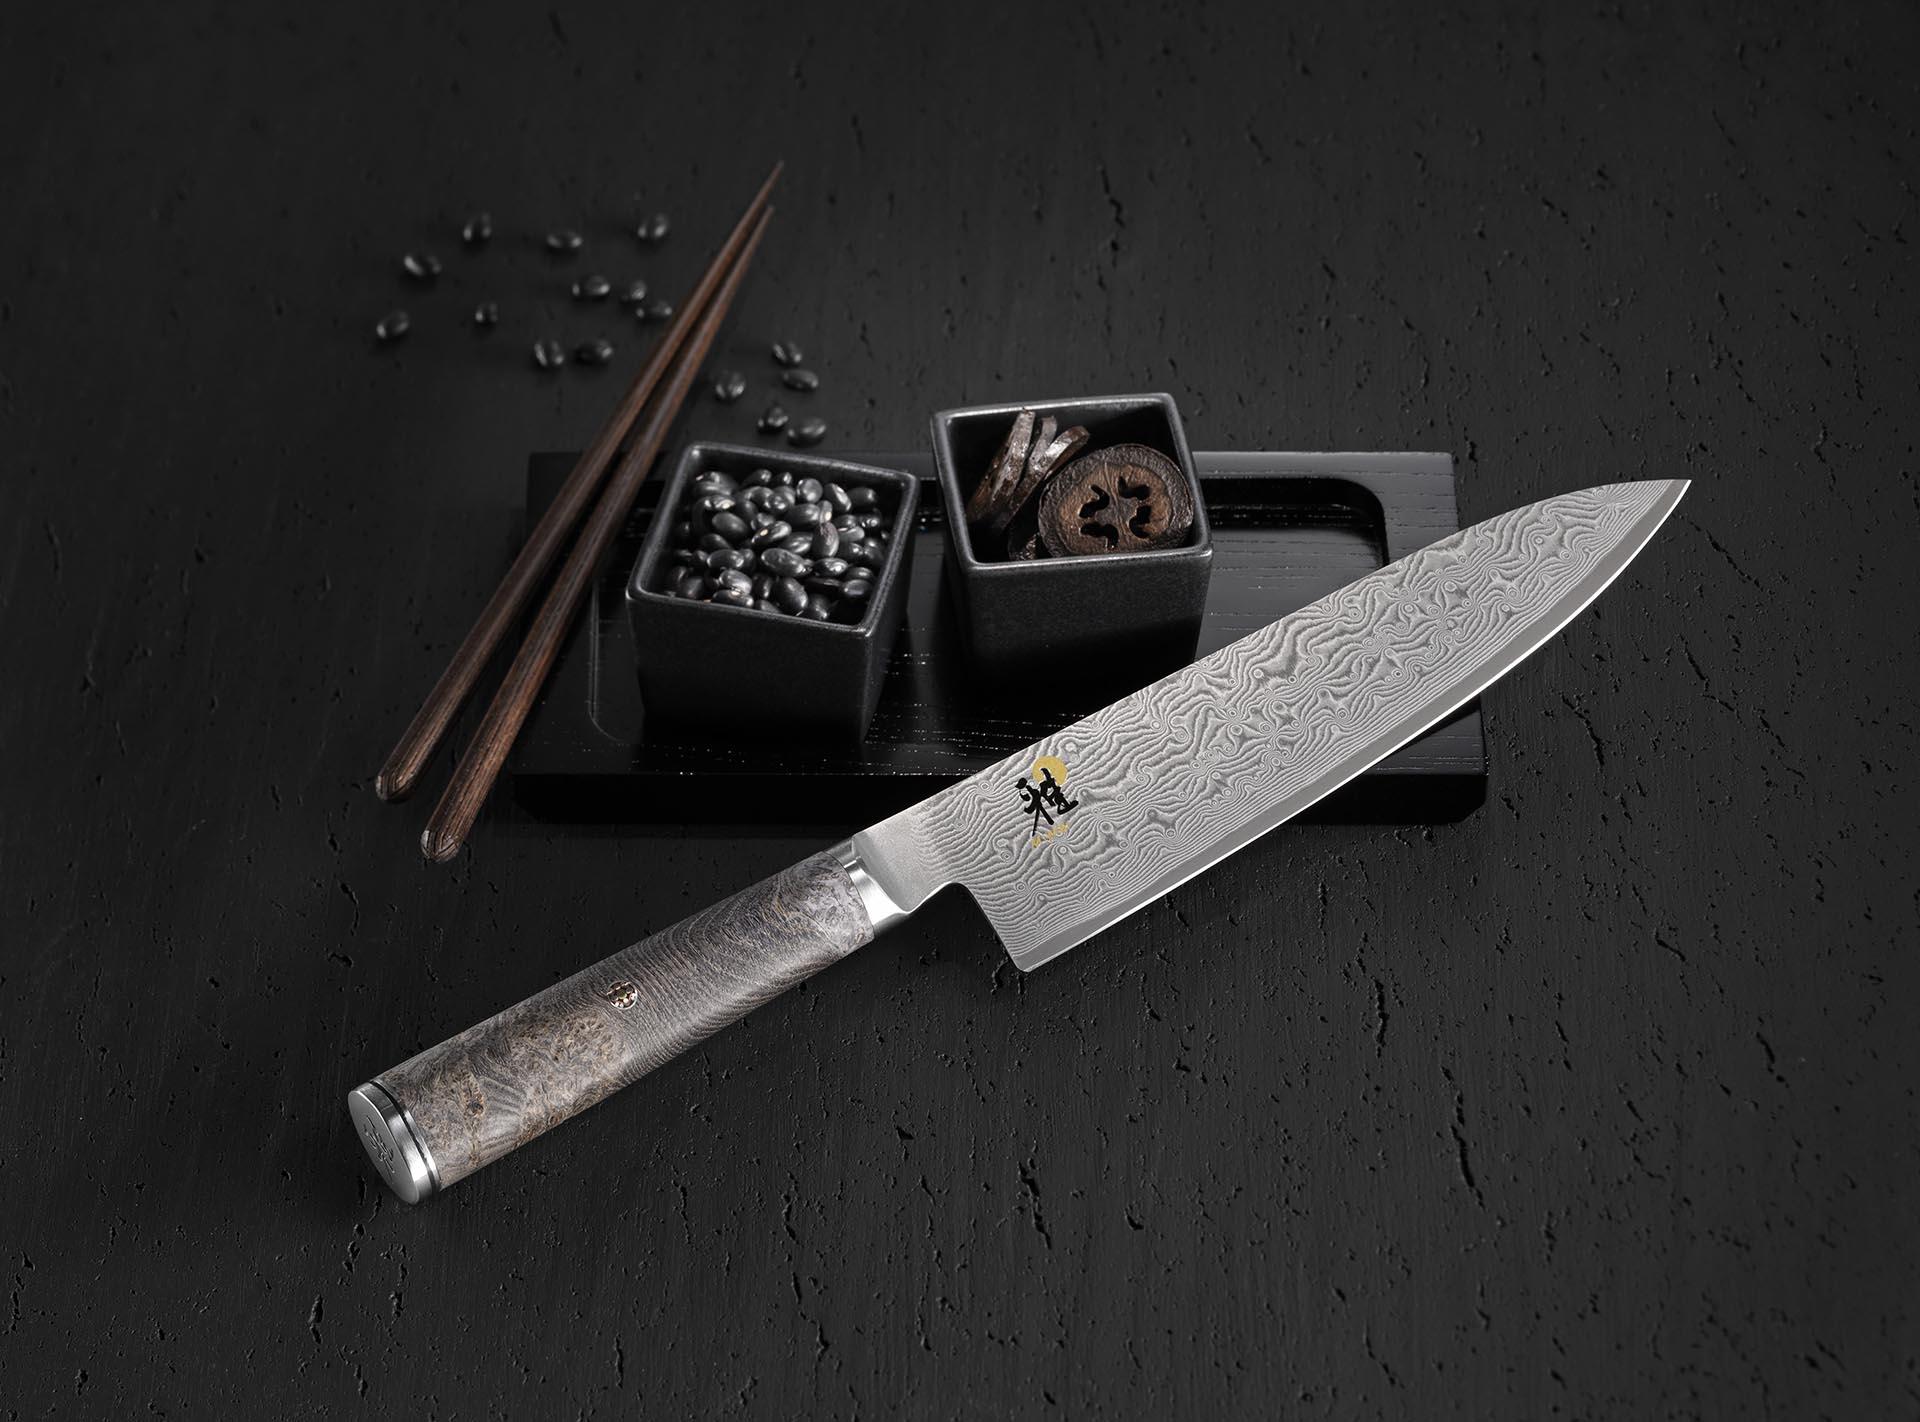 MIYABI 5000MCD 67 BLACK Gyutoh, Ahorn, 200 mm